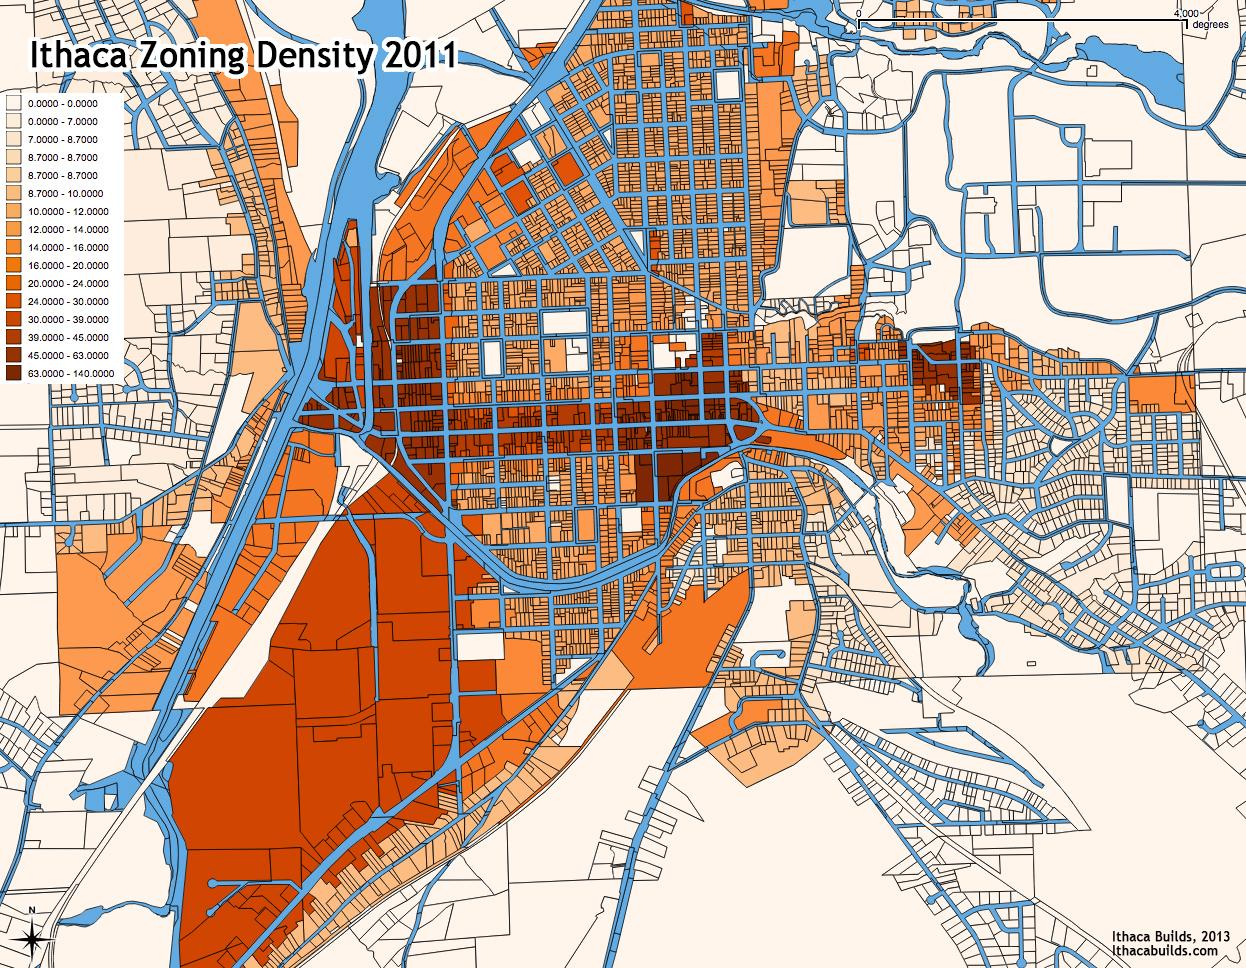 Ithaca_Zoning_Density_2011